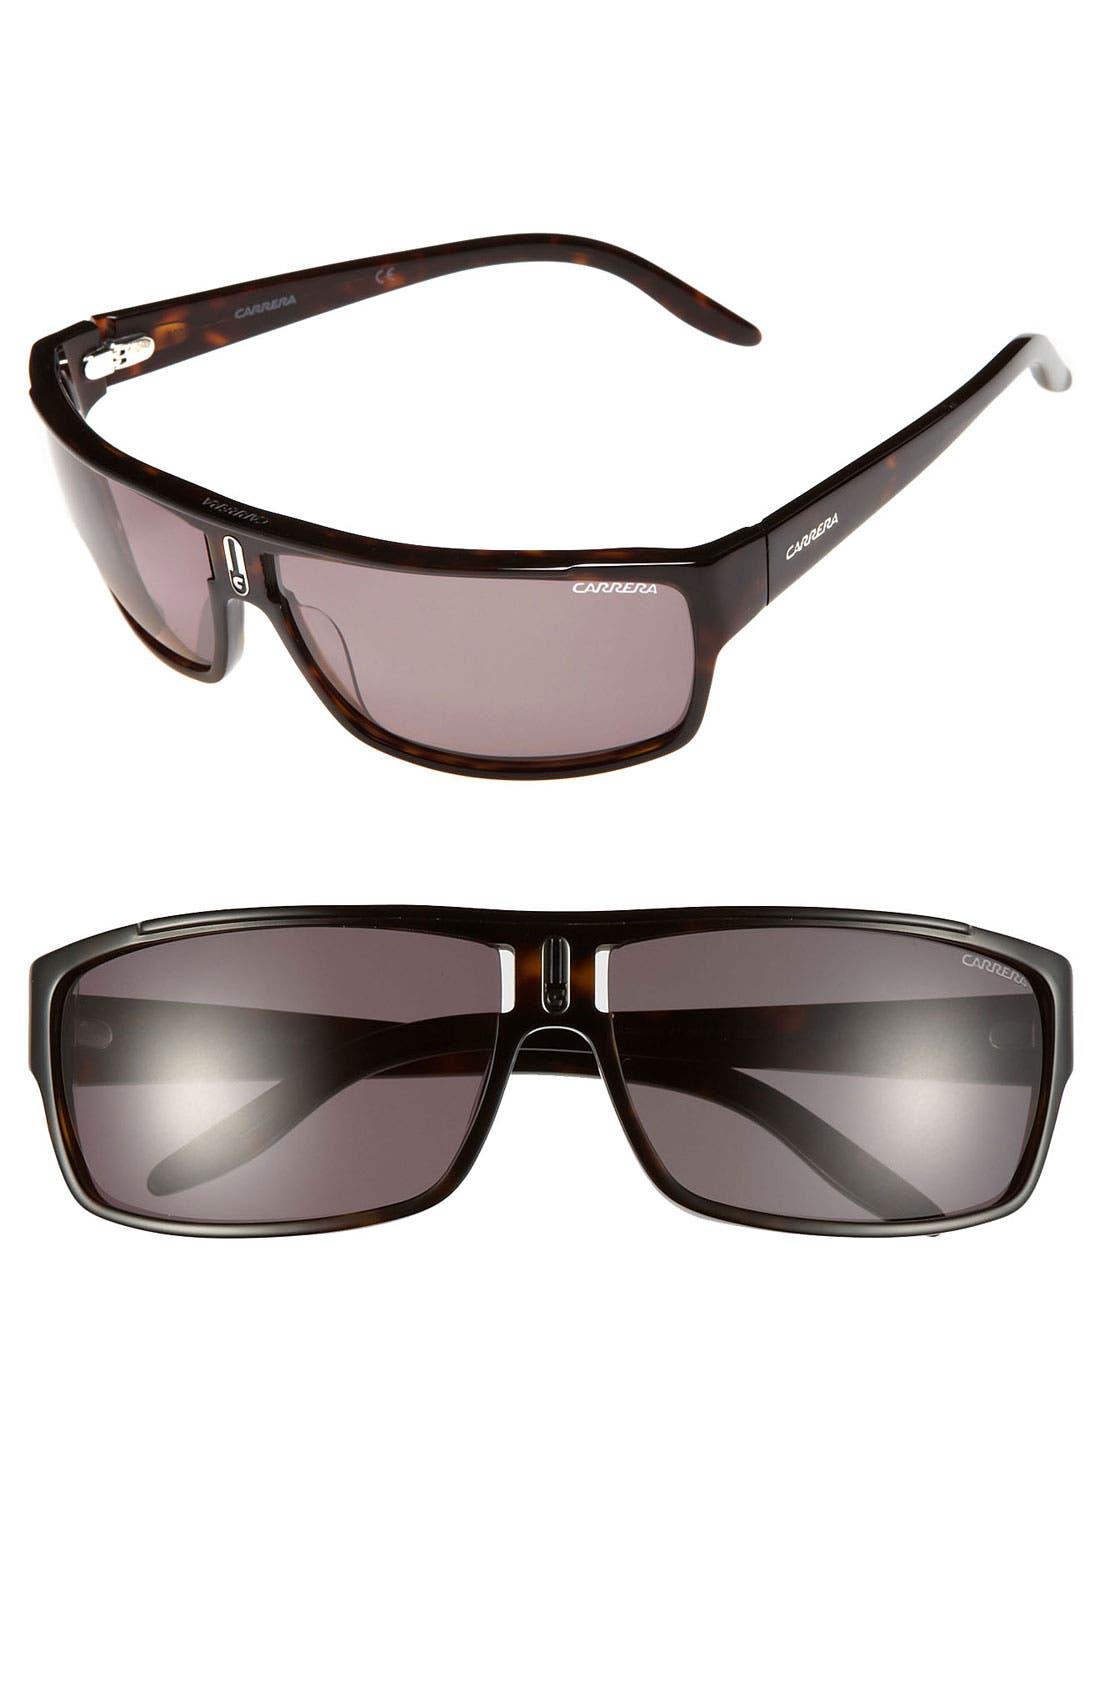 Main Image - Carrera Eyewear 65mm Sunglasses